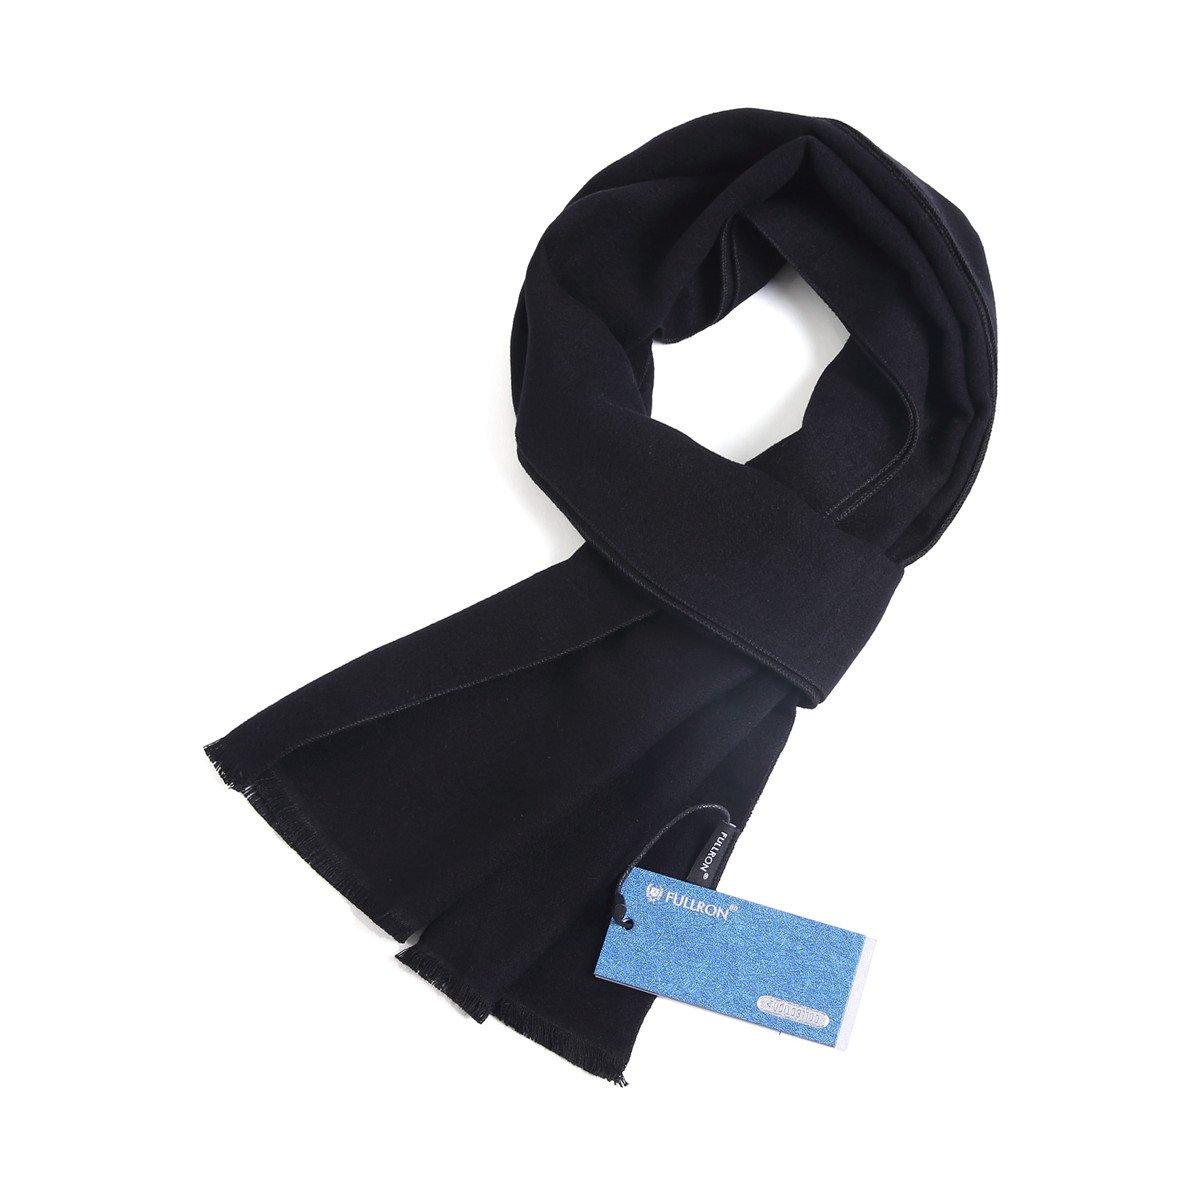 FULLRON Men Cashmere Winter Scarf Long Warm Scarves, Black Cotton Scarf for Men